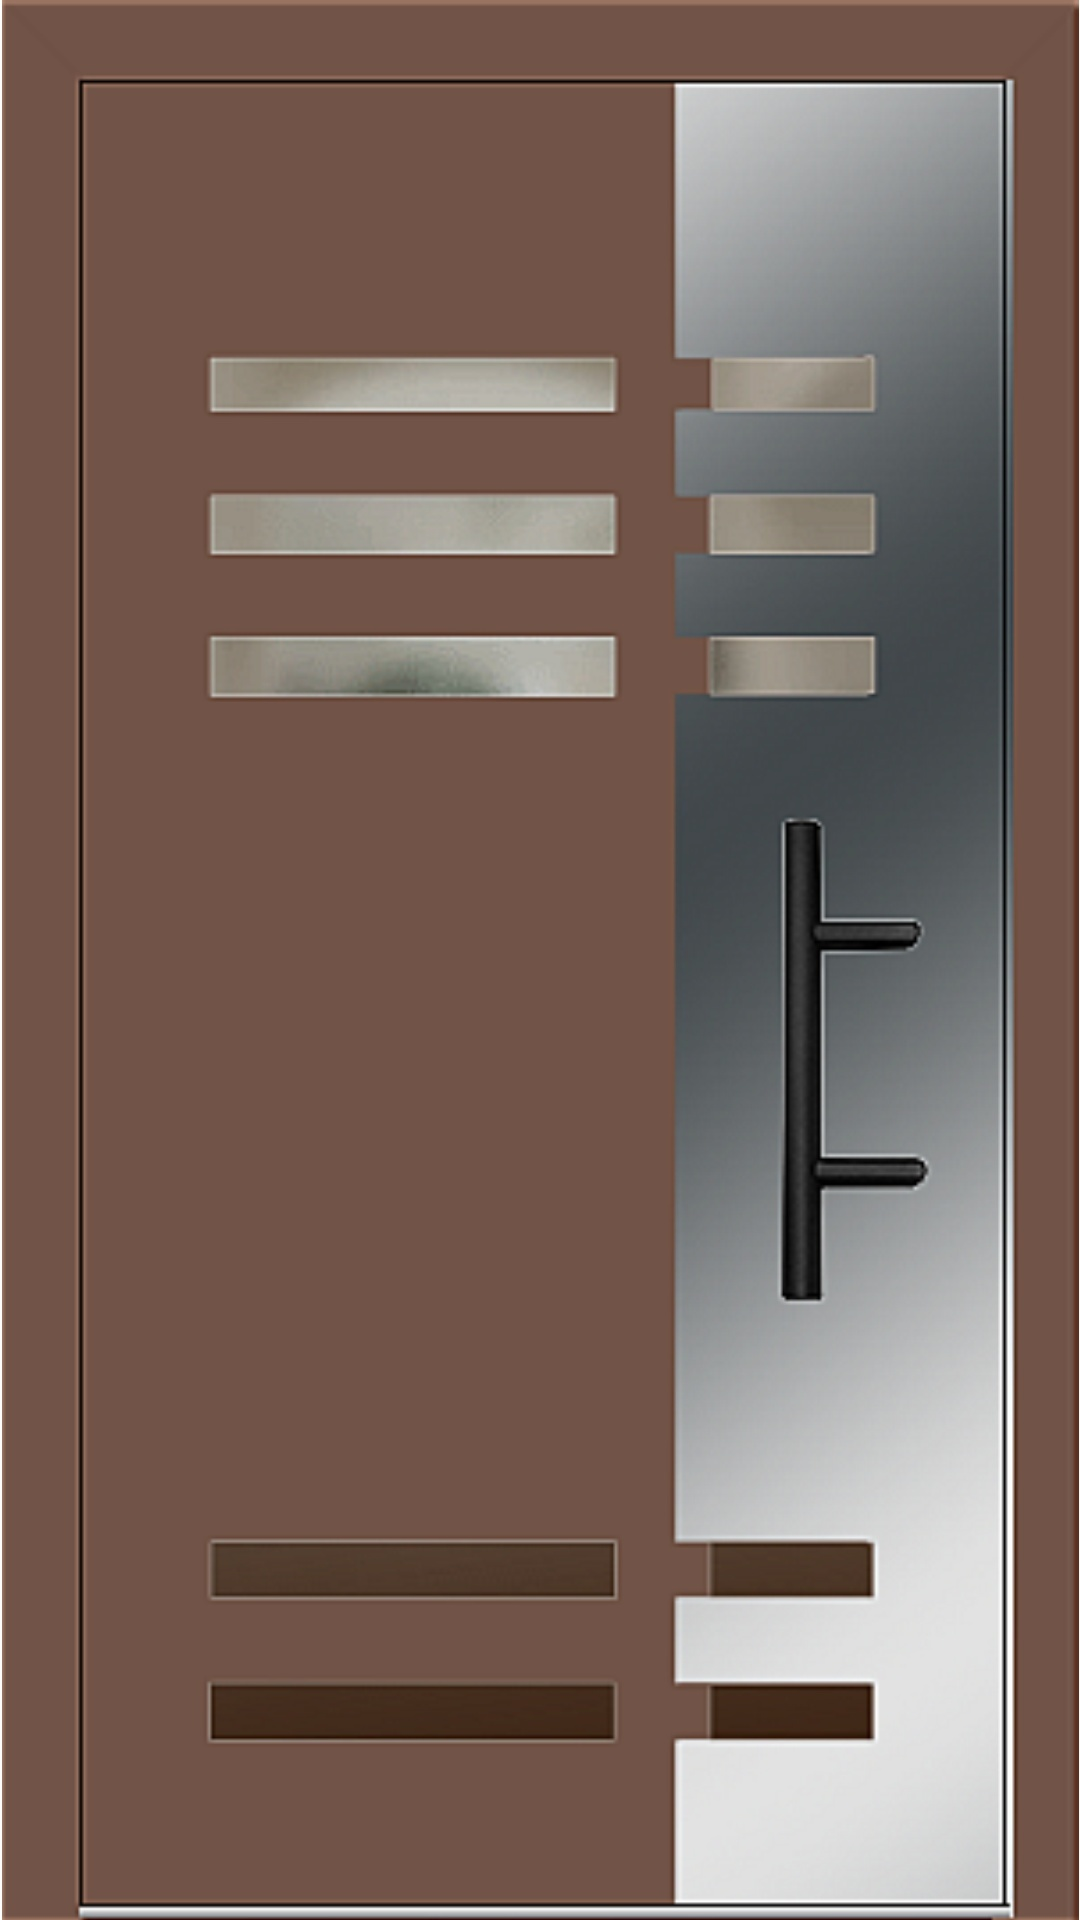 Holz-Alu Haustür Modell 66501 lehmbraun